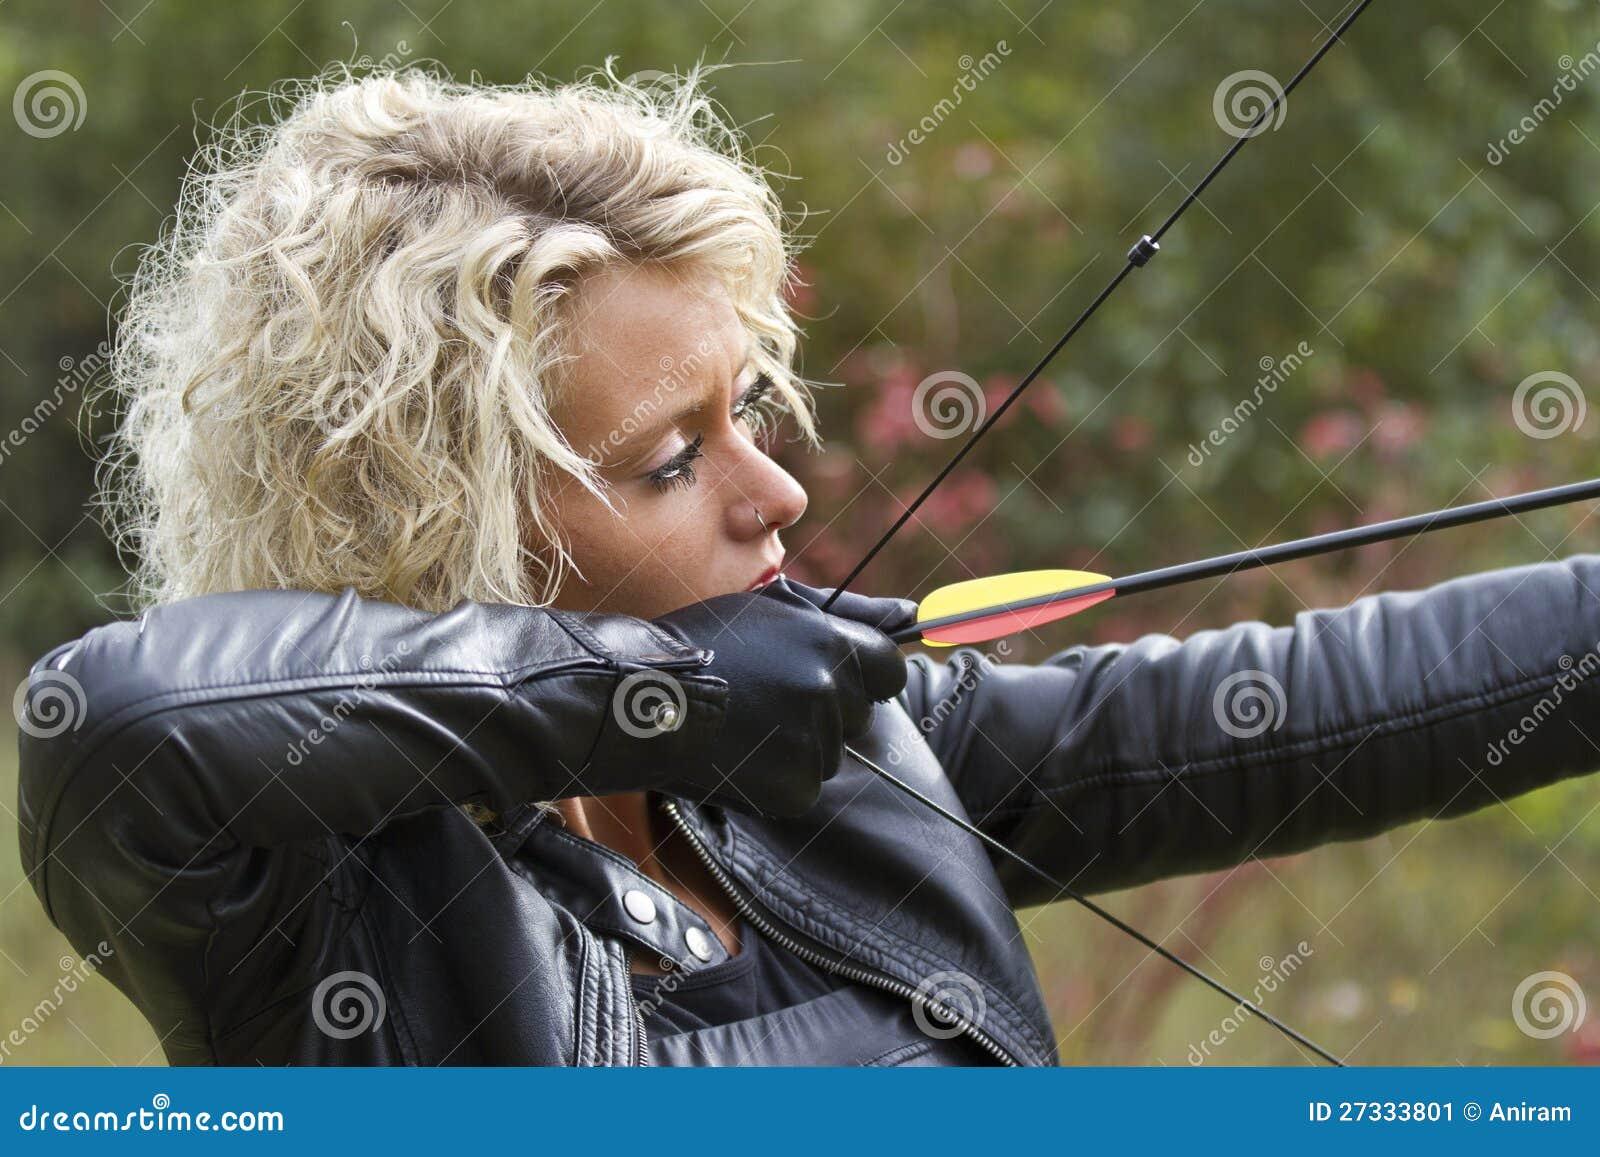 b92079997ce5c Woman Shooting With Bow And Arrow Stock Image - Image of violence ...